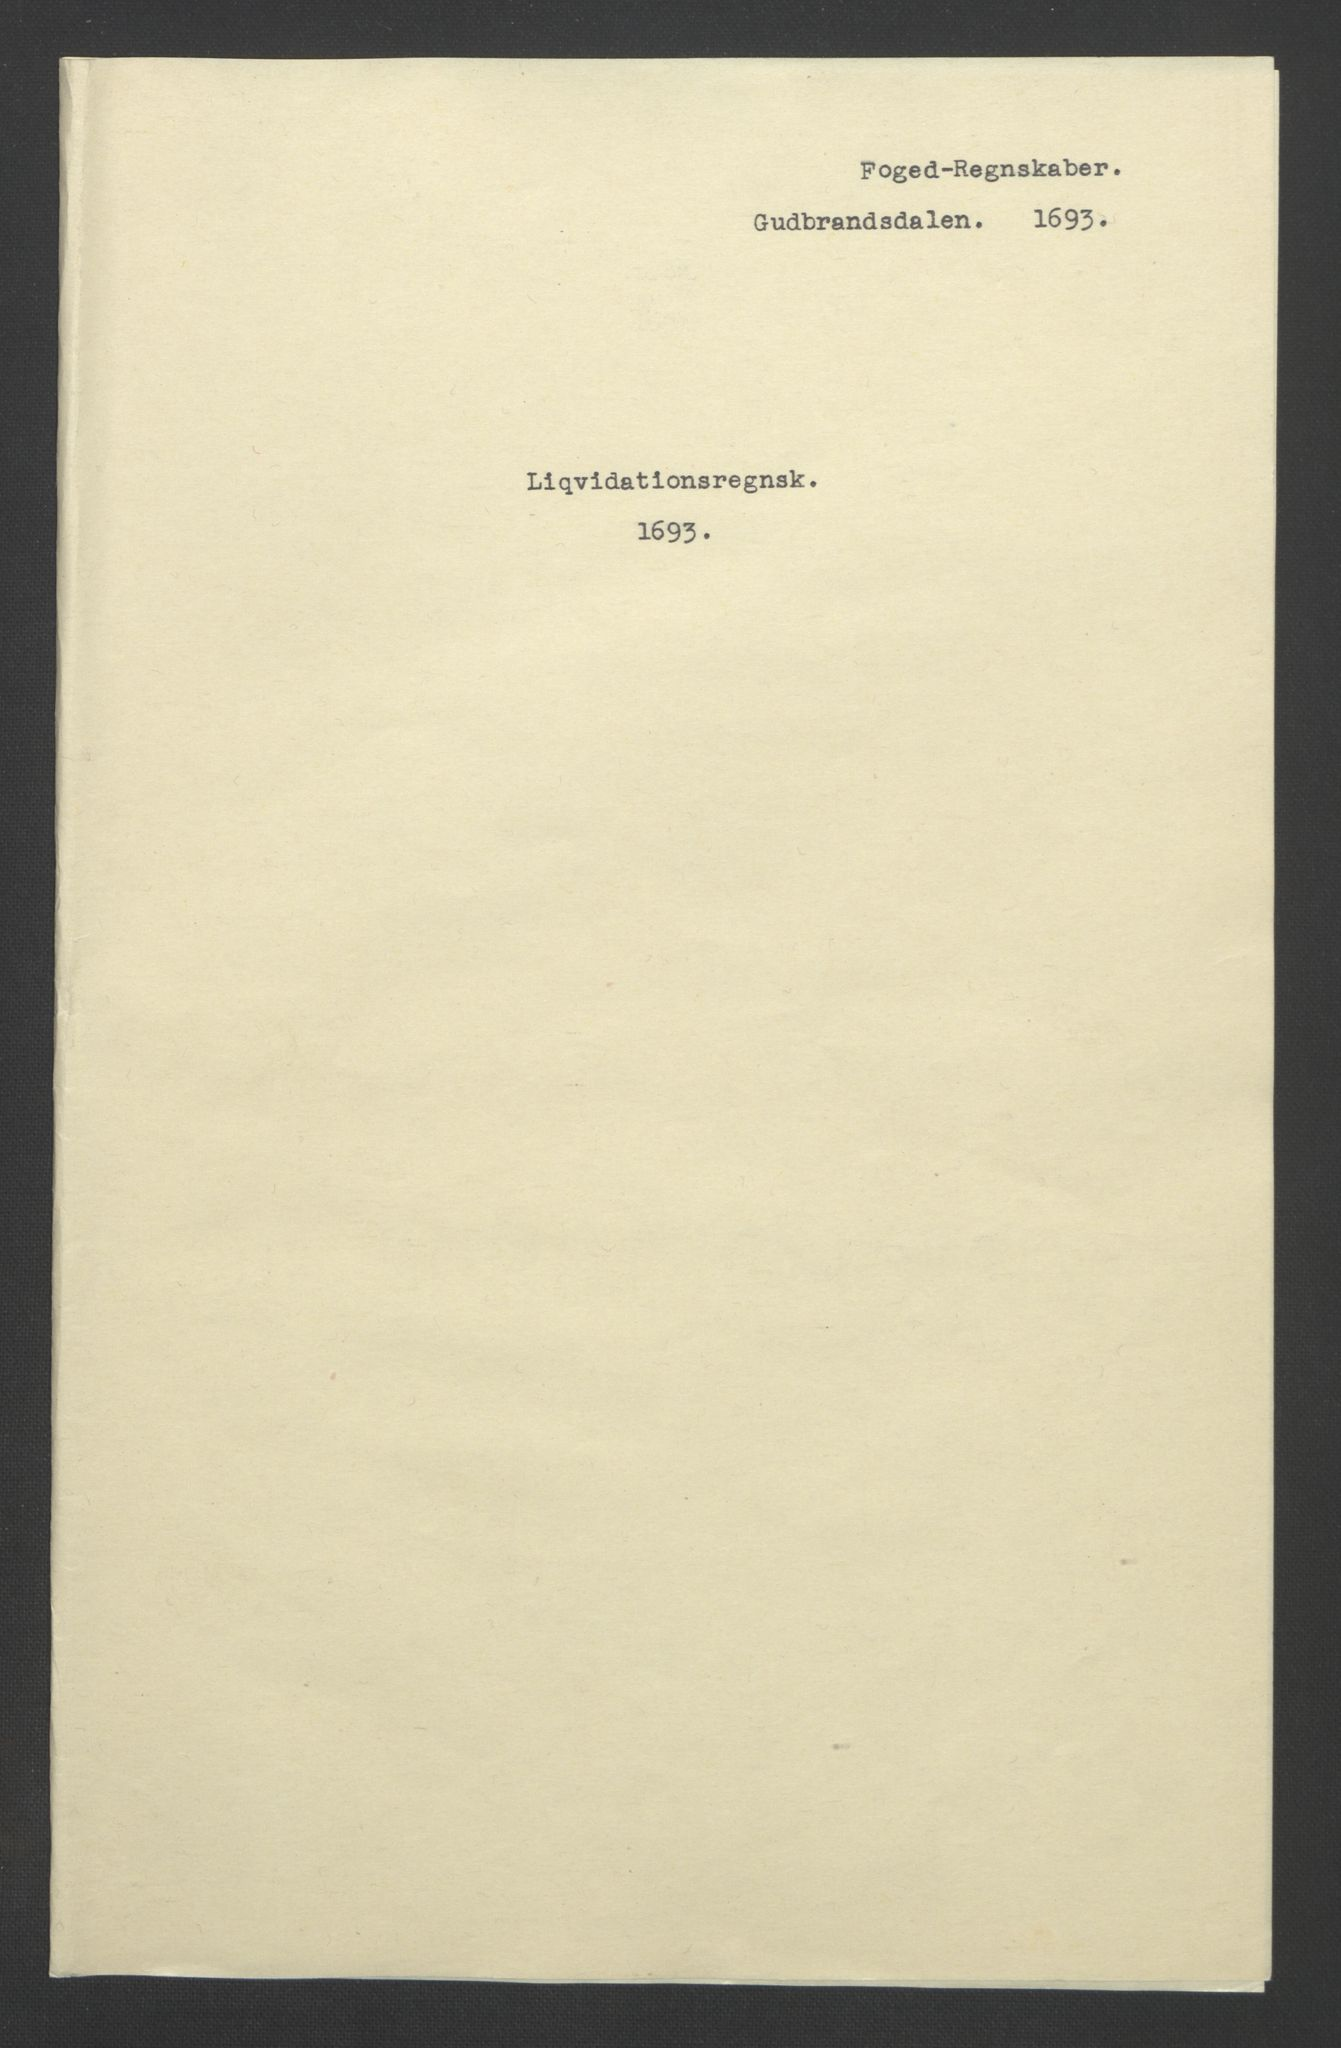 RA, Rentekammeret inntil 1814, Reviderte regnskaper, Fogderegnskap, R17/L1167: Fogderegnskap Gudbrandsdal, 1693, s. 3